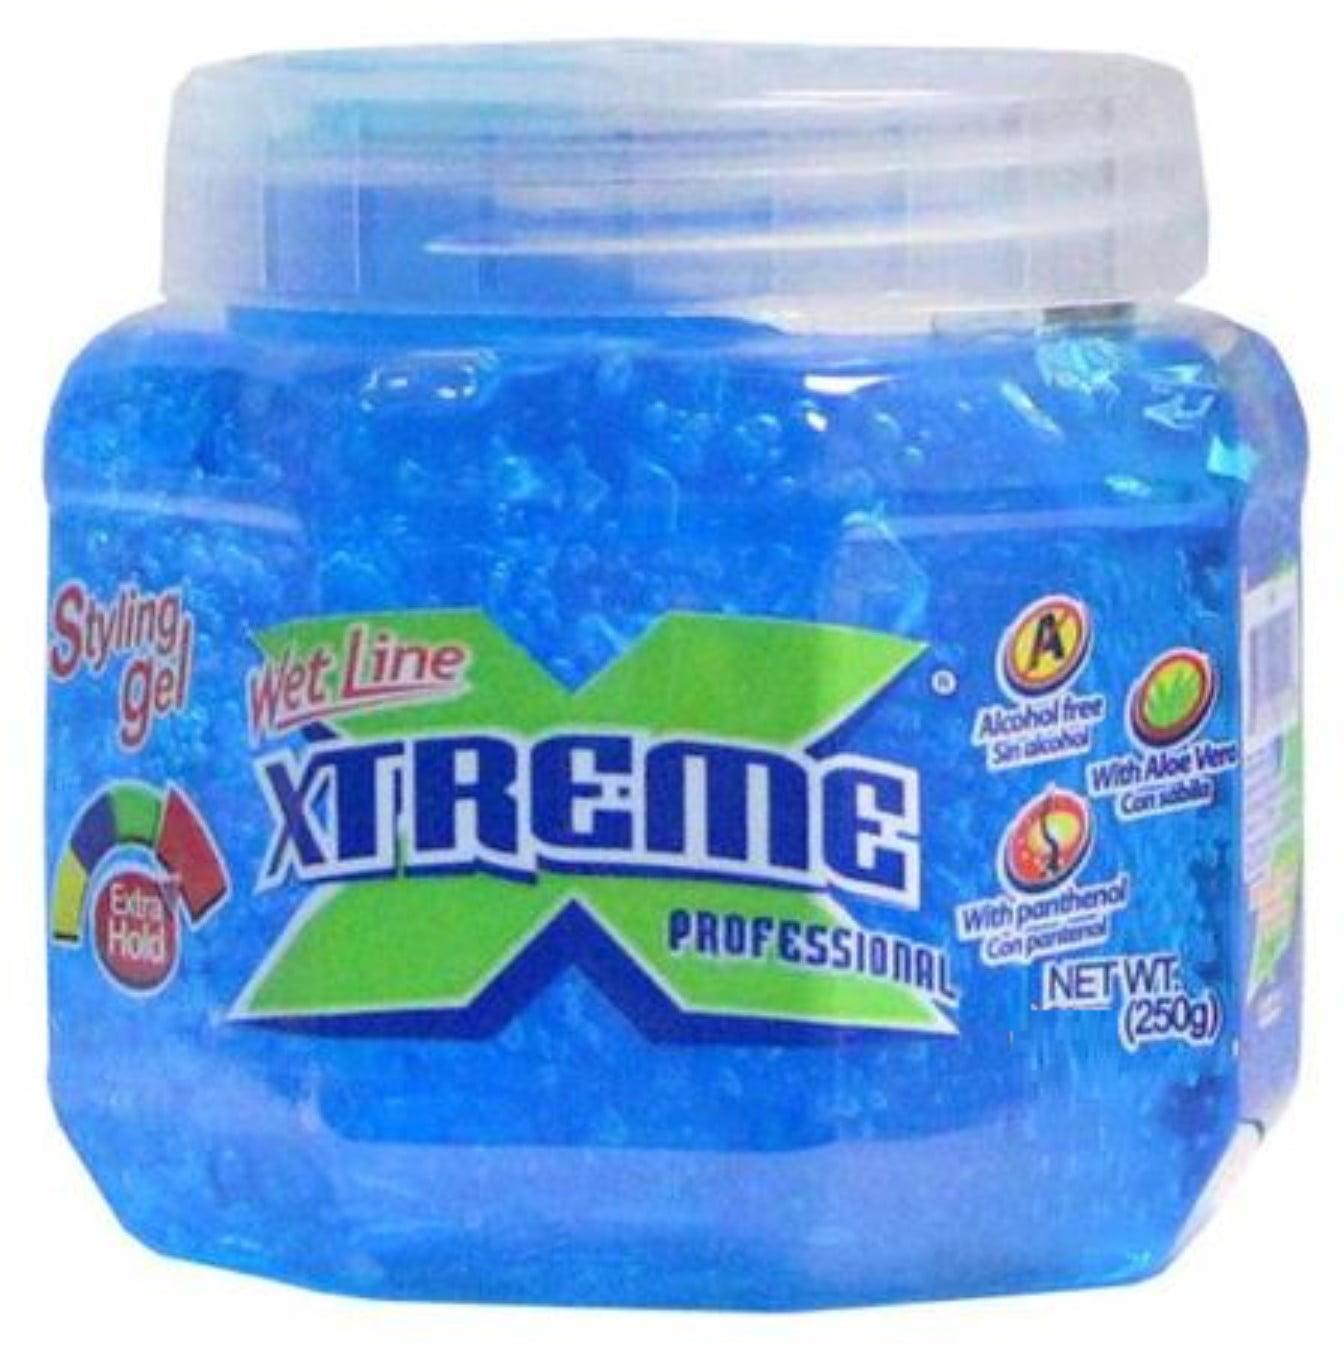 xtreme professional jumbo clear jar 35 walmart com